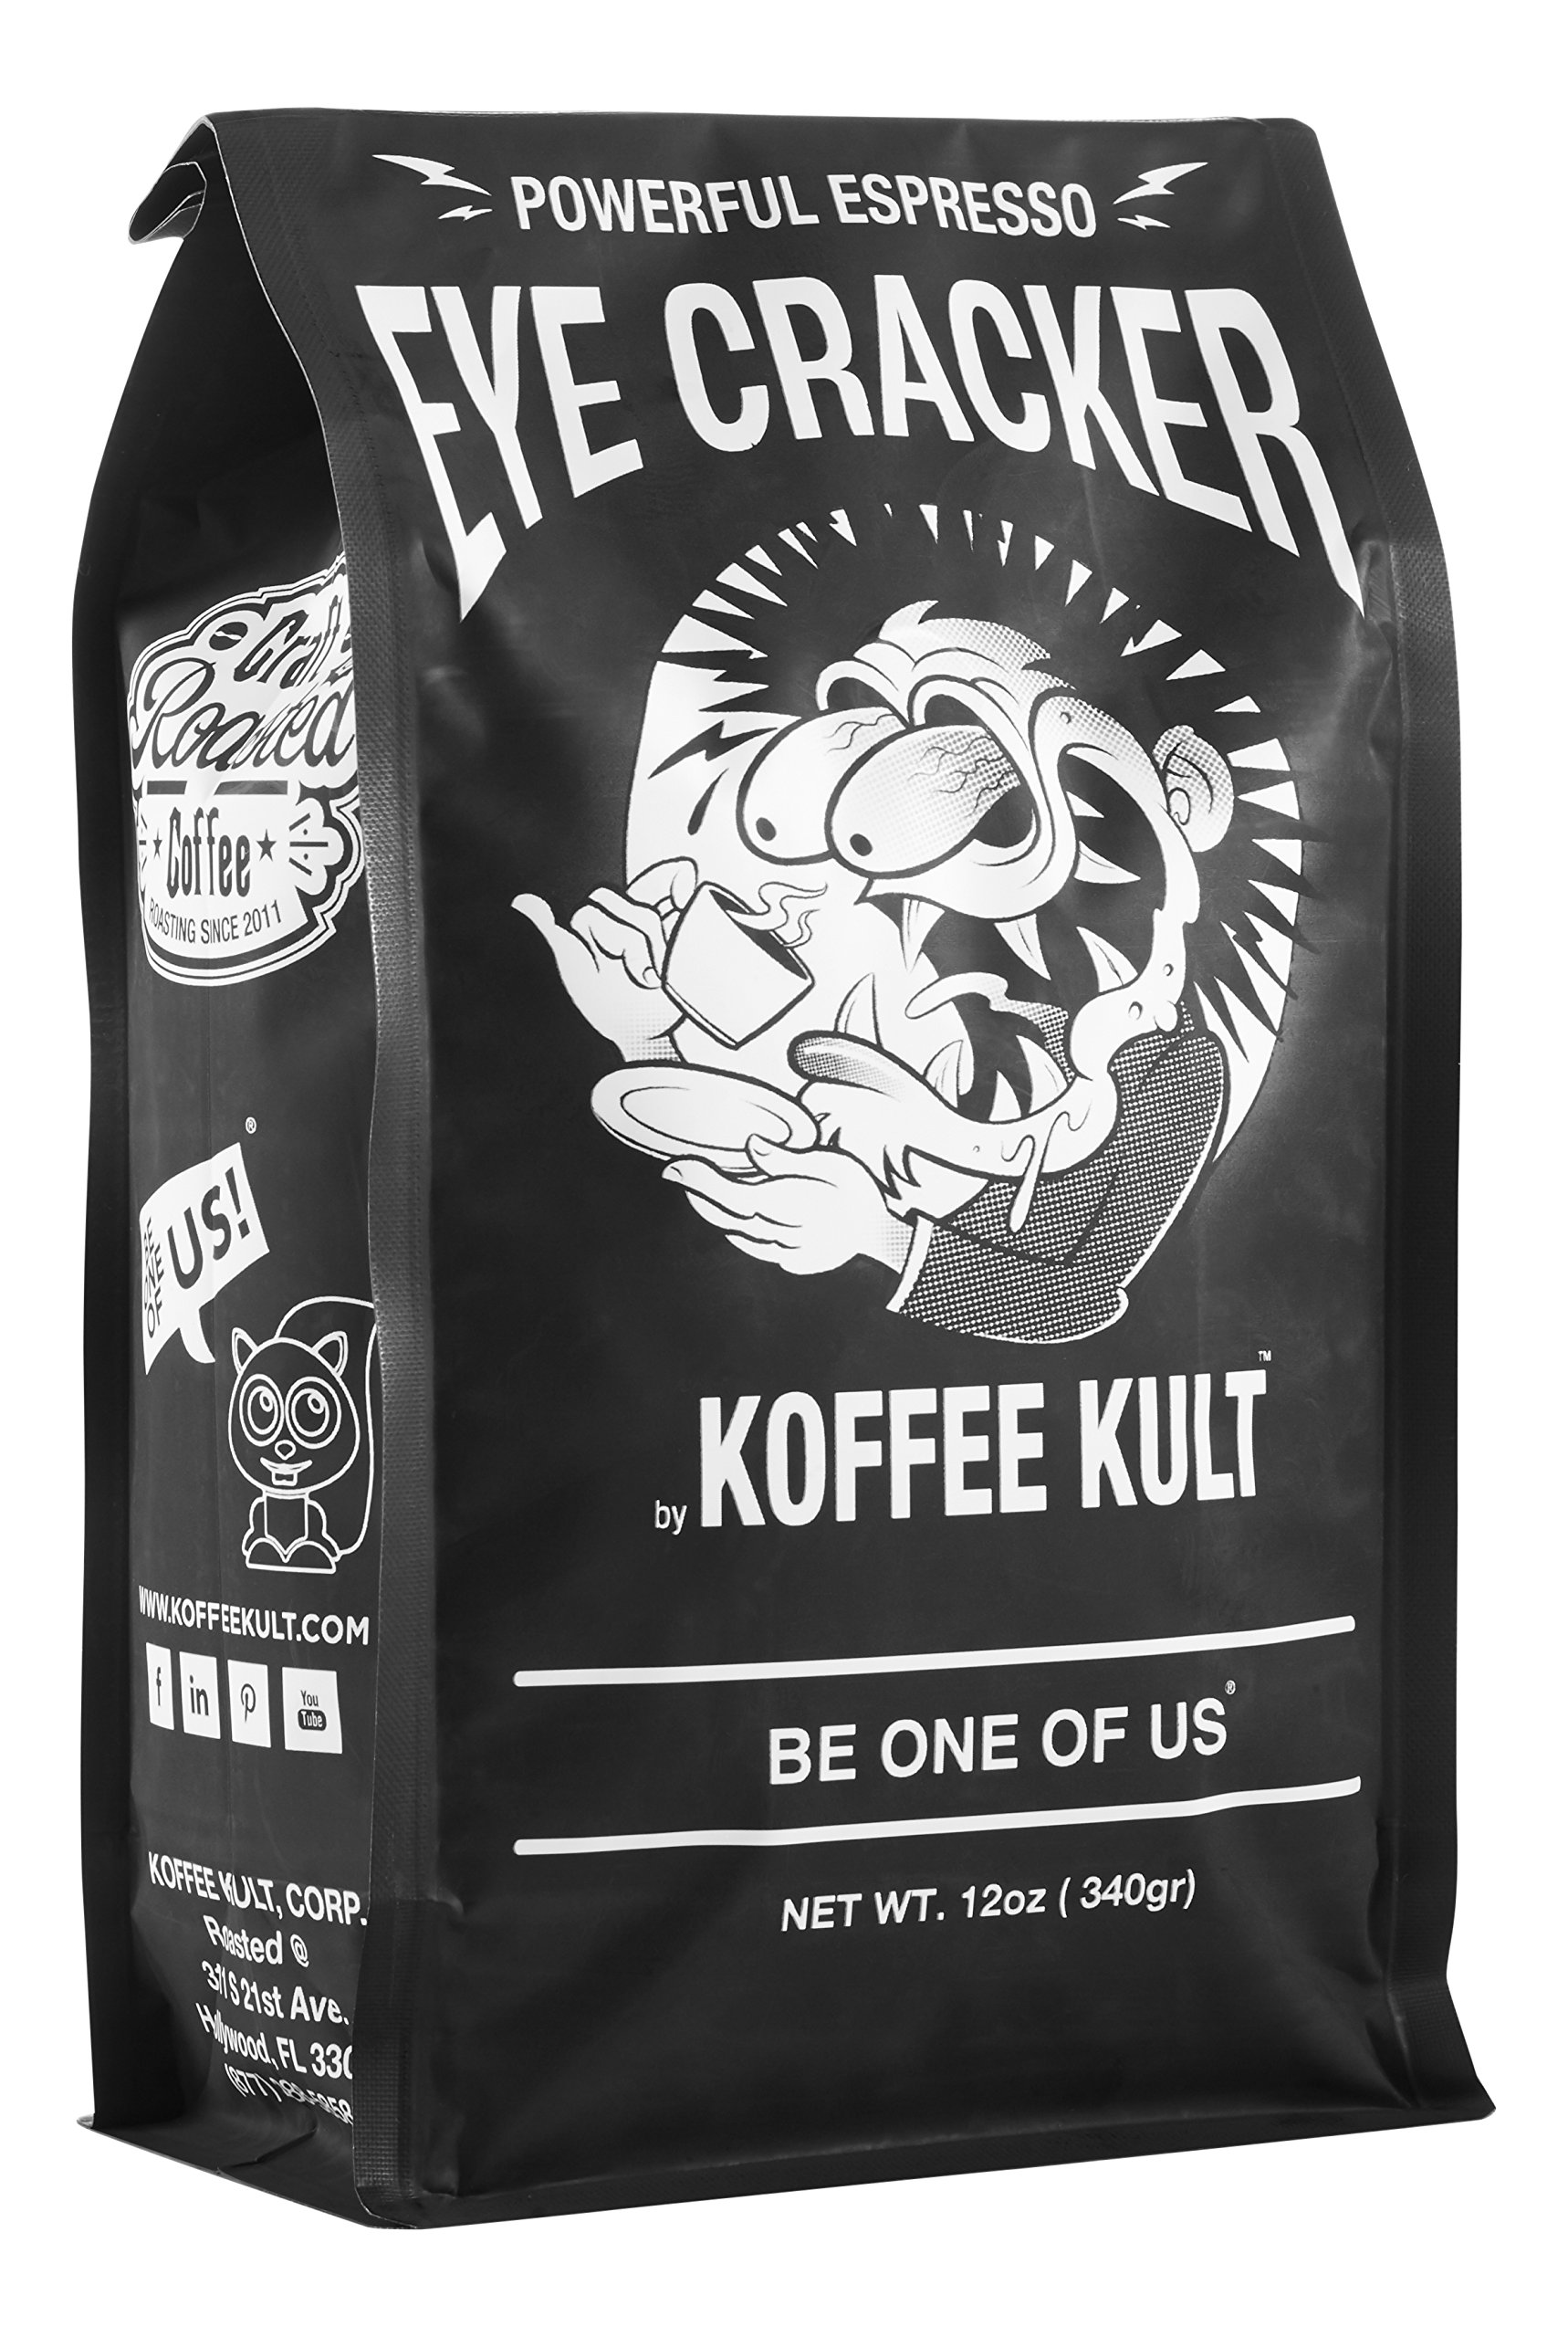 Koffee Kult Eye Cracker Espresso Beans - Bright, Bold Medium Roast with a Citrus Twist Coffee (12oz)